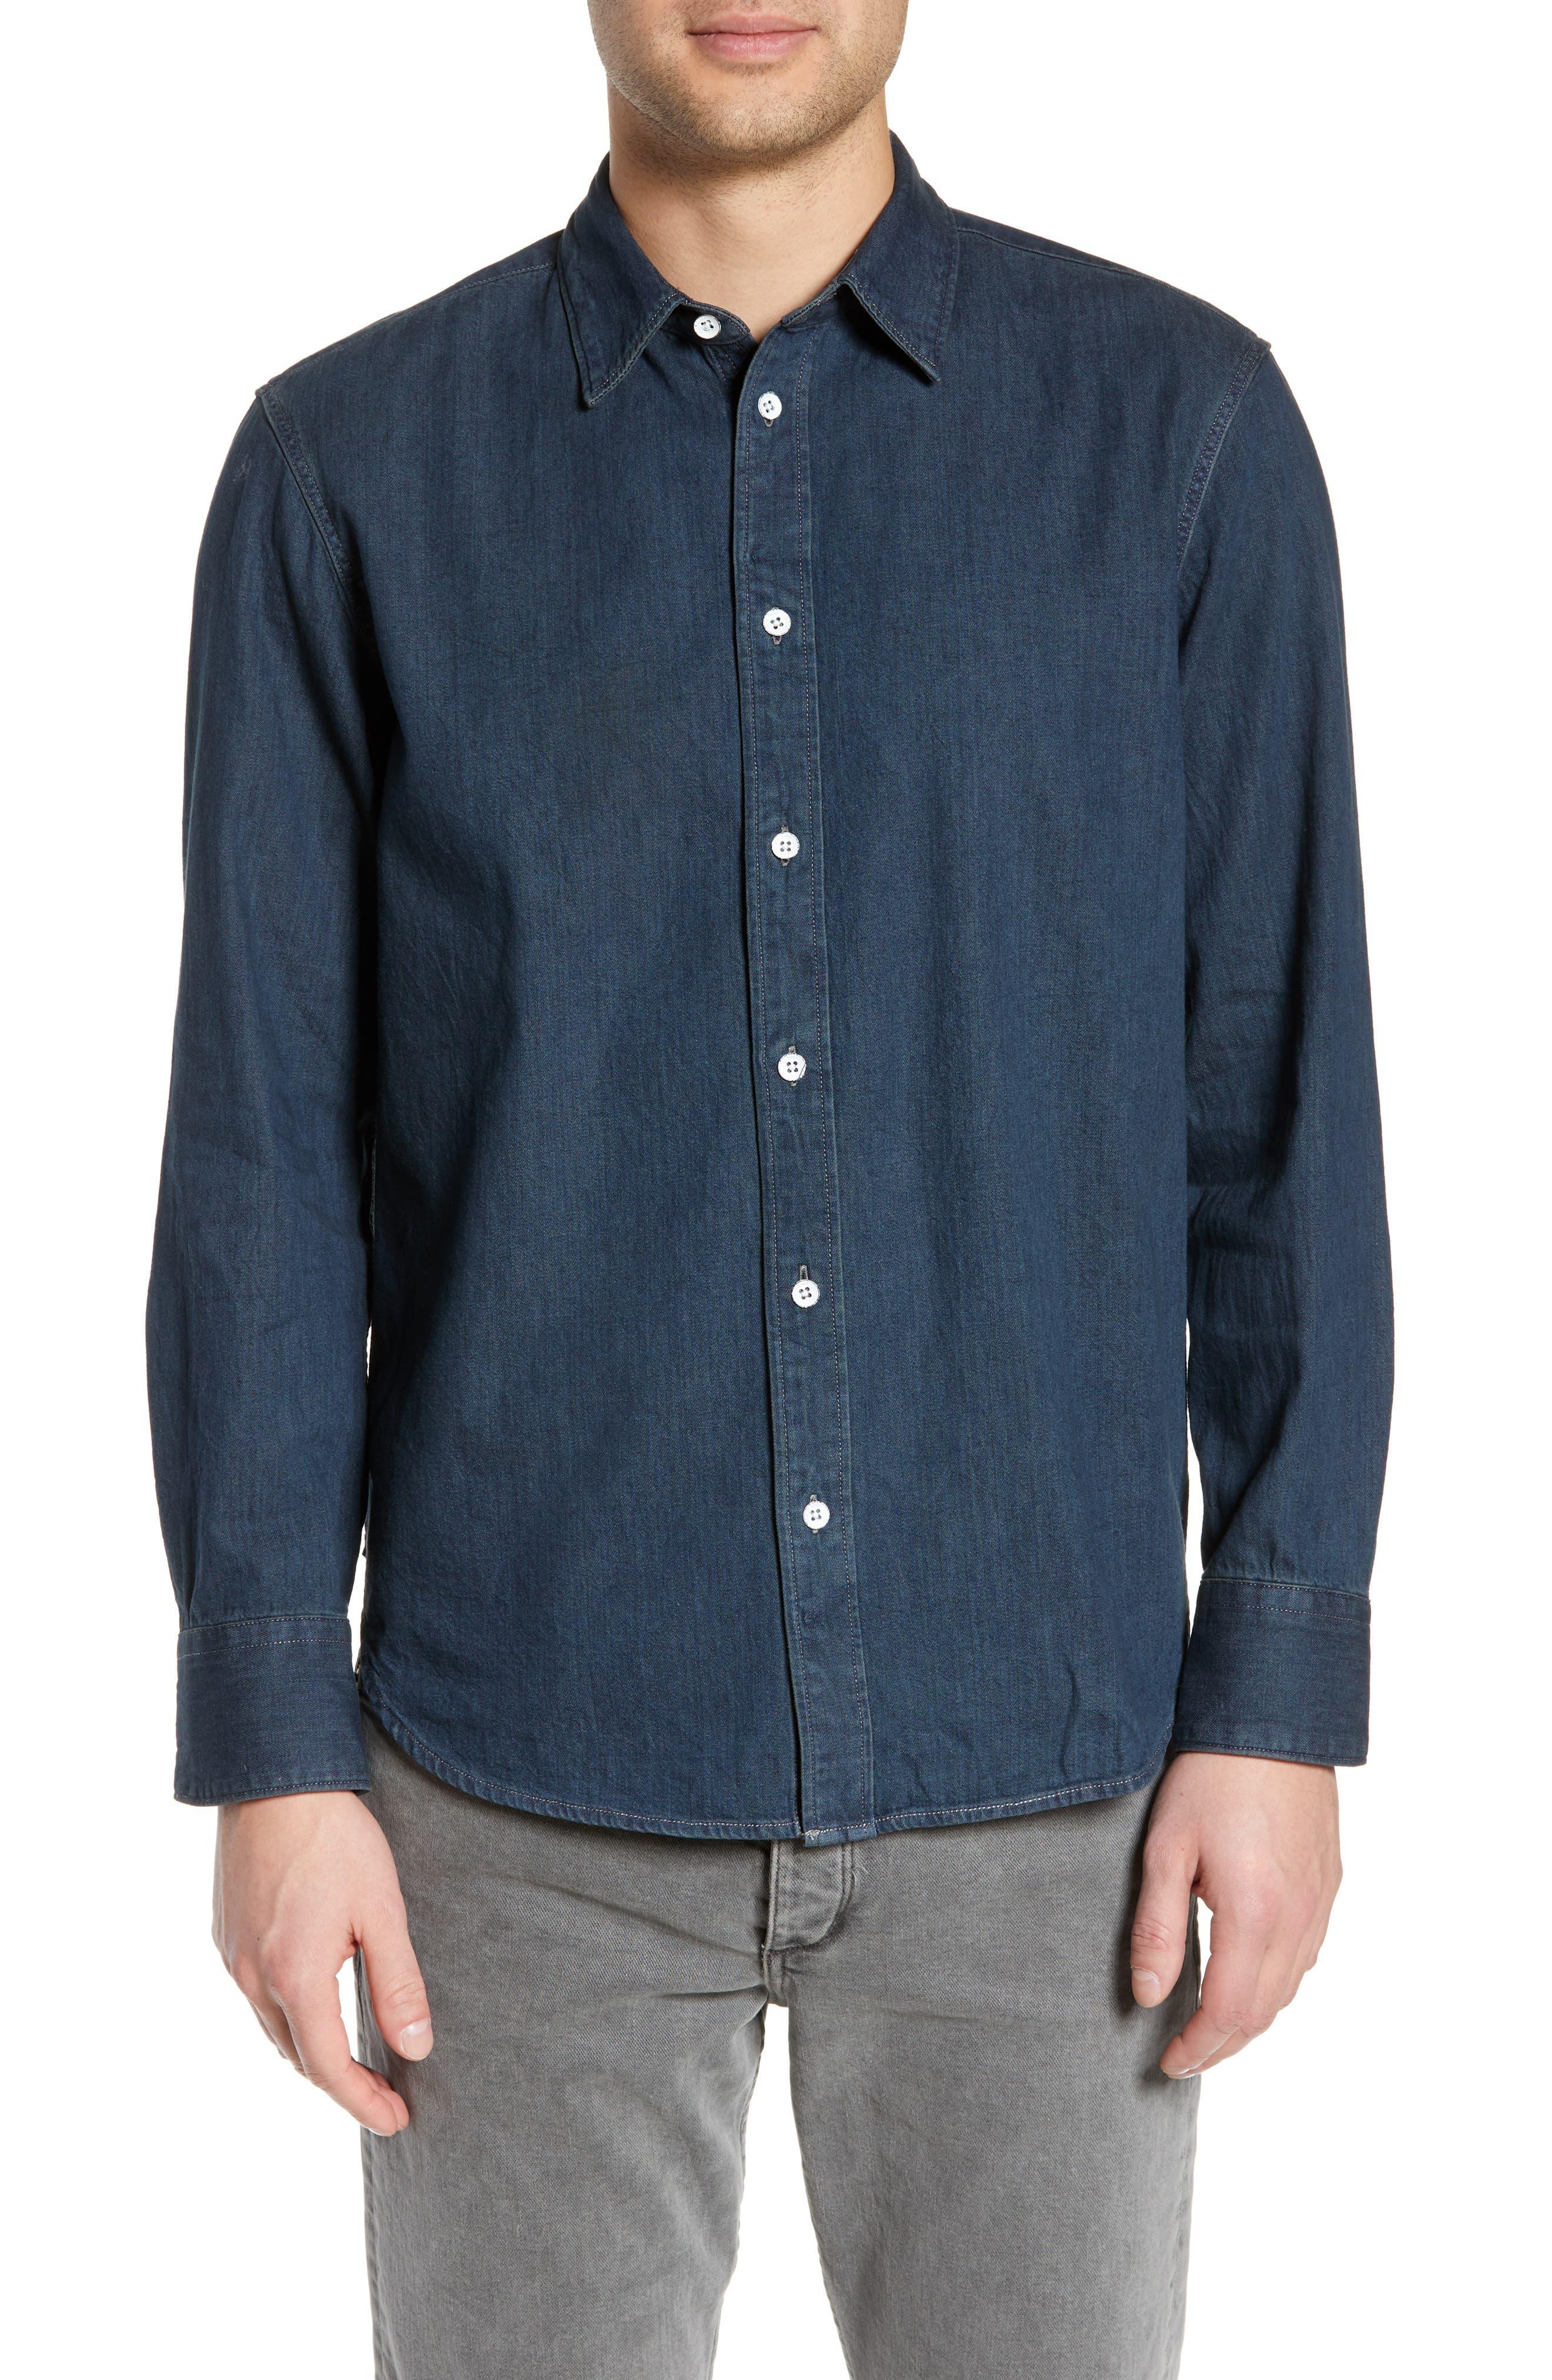 RAG & BONE Fit 3 Denim Sport Shirt, Main, color, STONE BLUE